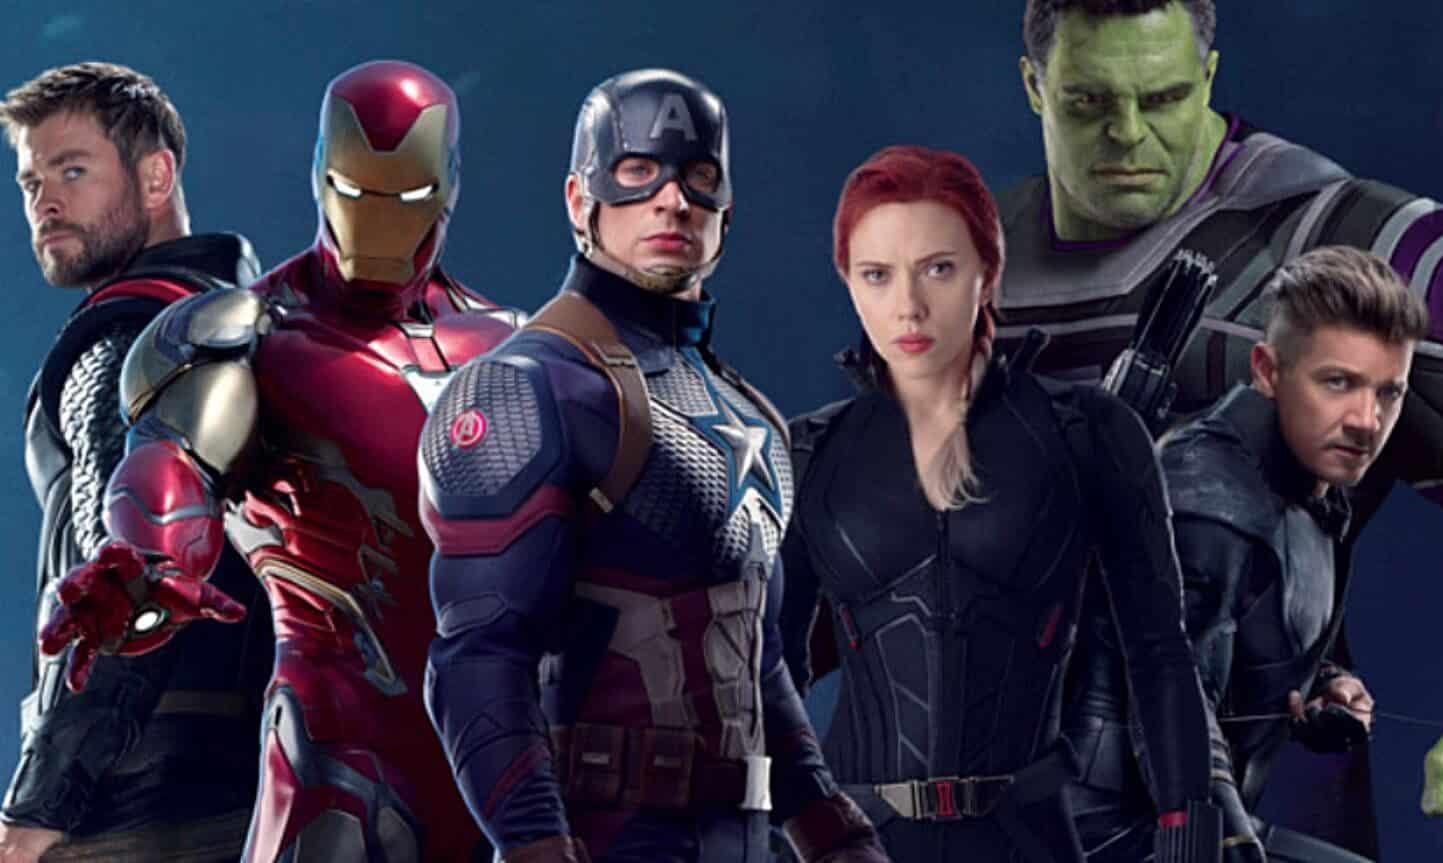 Avengers: Endgame' Image Reveals The Team's New Costumes